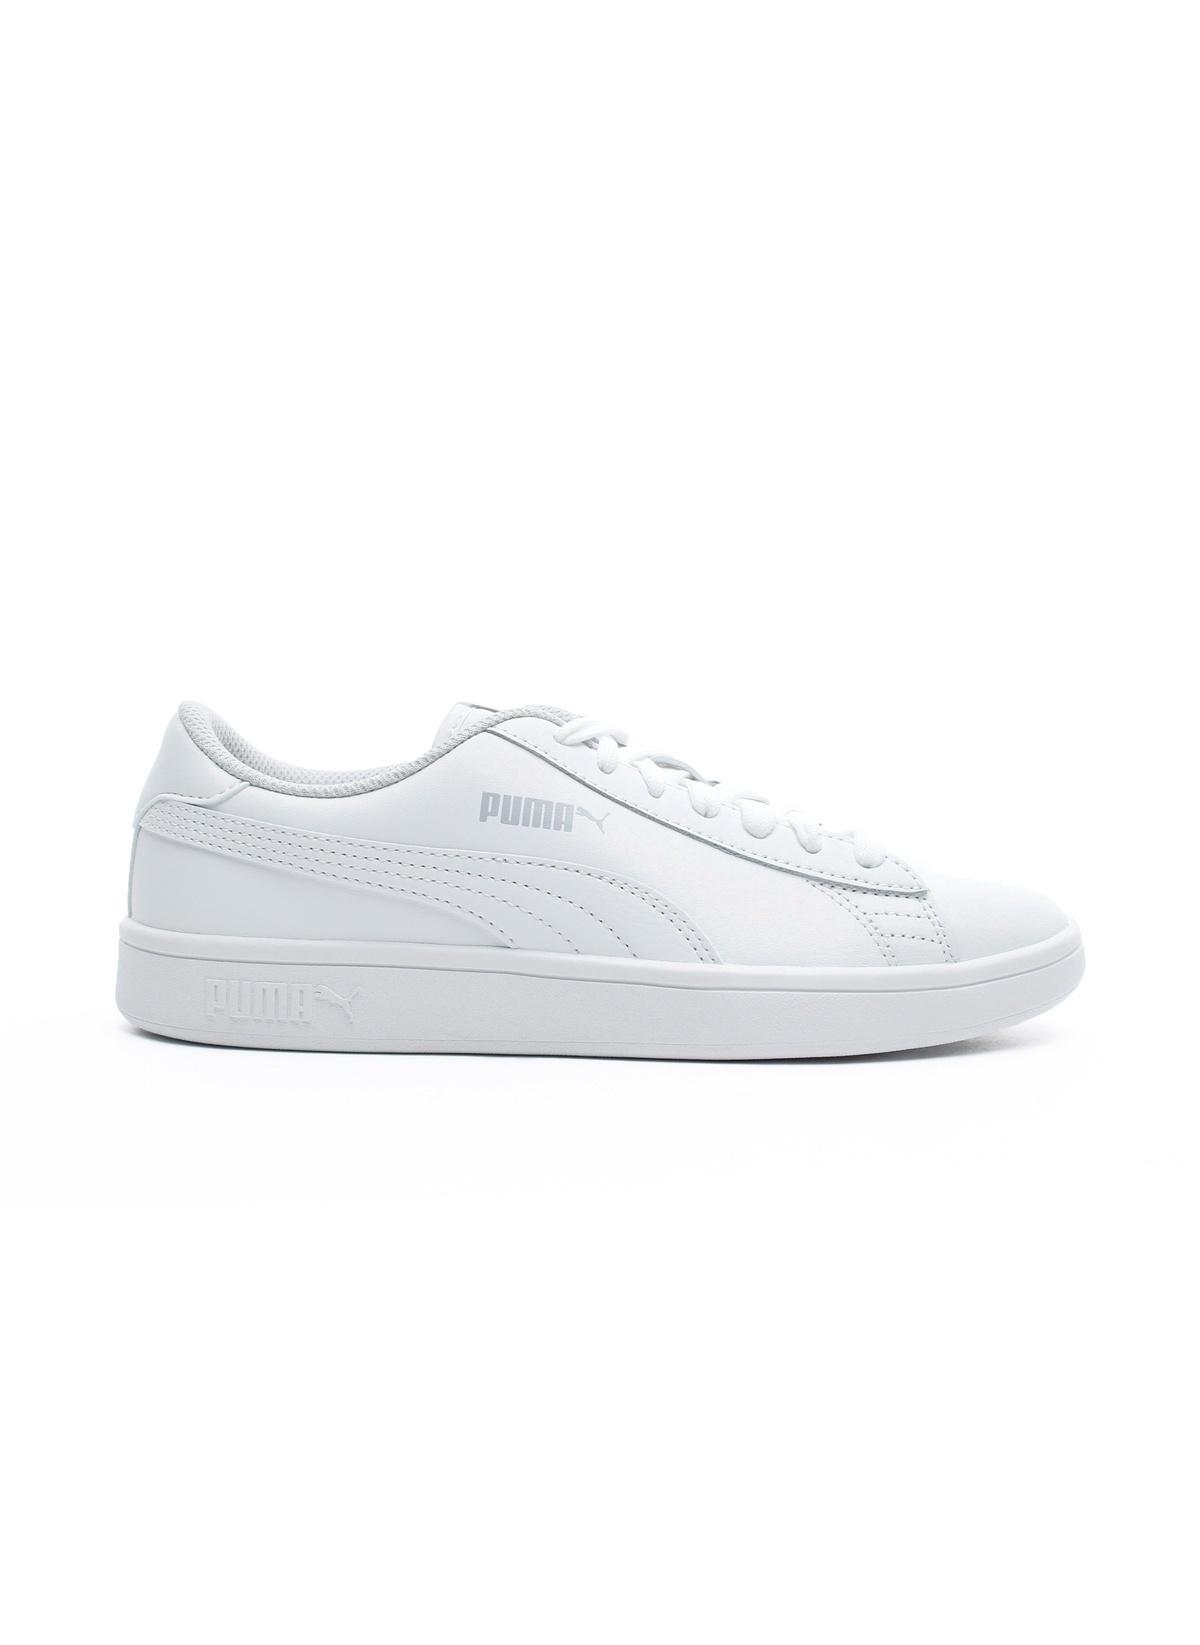 Puma Kadin Spor Ayakkabi Beyaz Morhipo 25169919